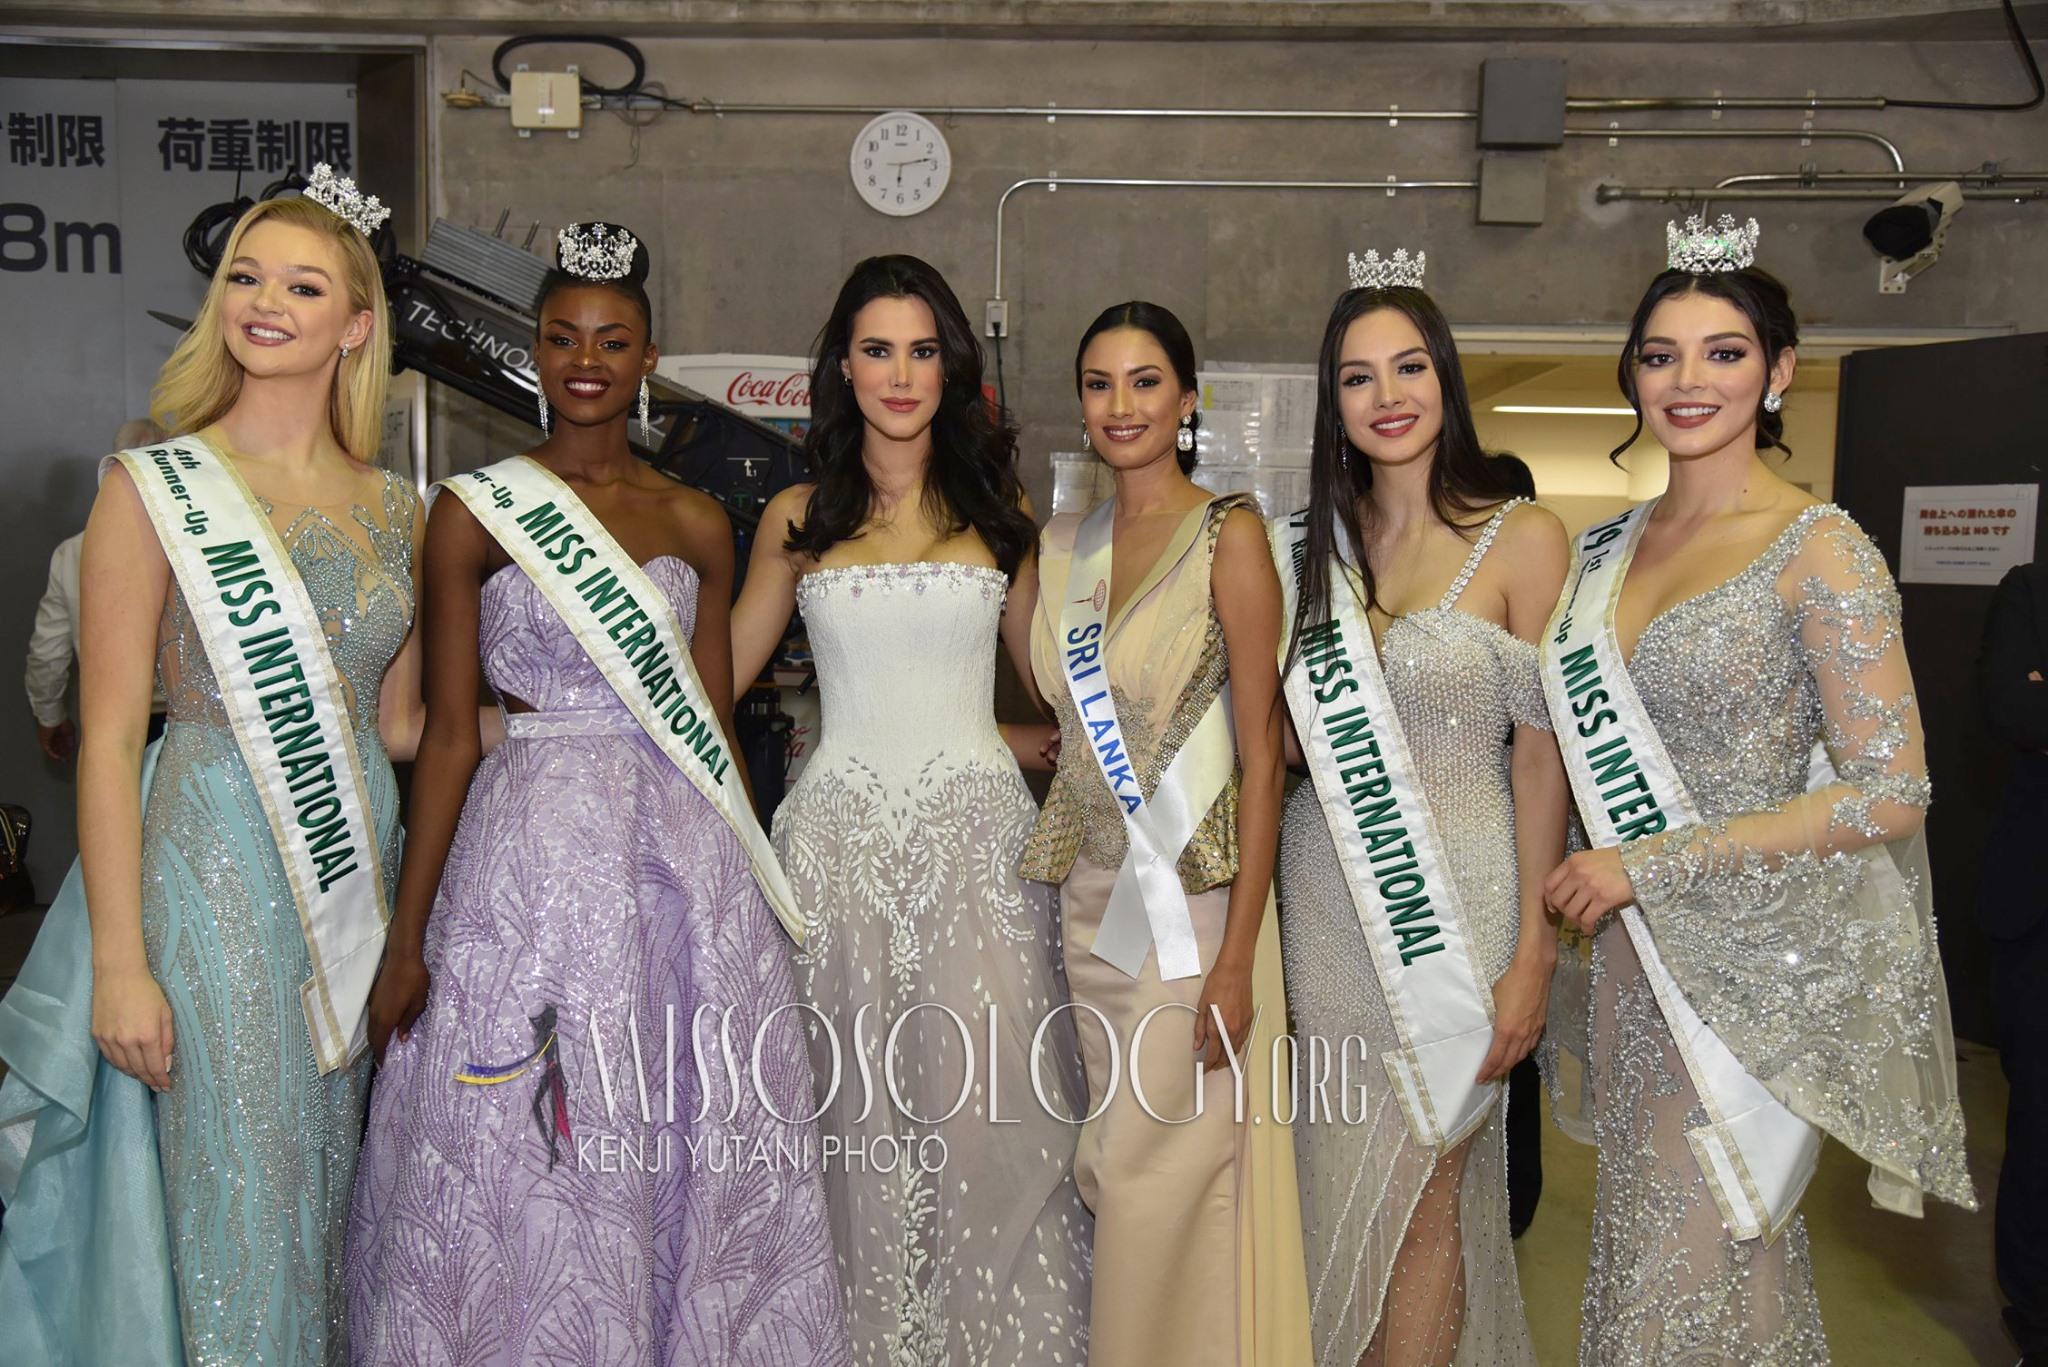 maria alejandra vengoechea, miss colombia hispanoamericana 2021/3rd runner-up de miss international 2019. - Página 13 75362110